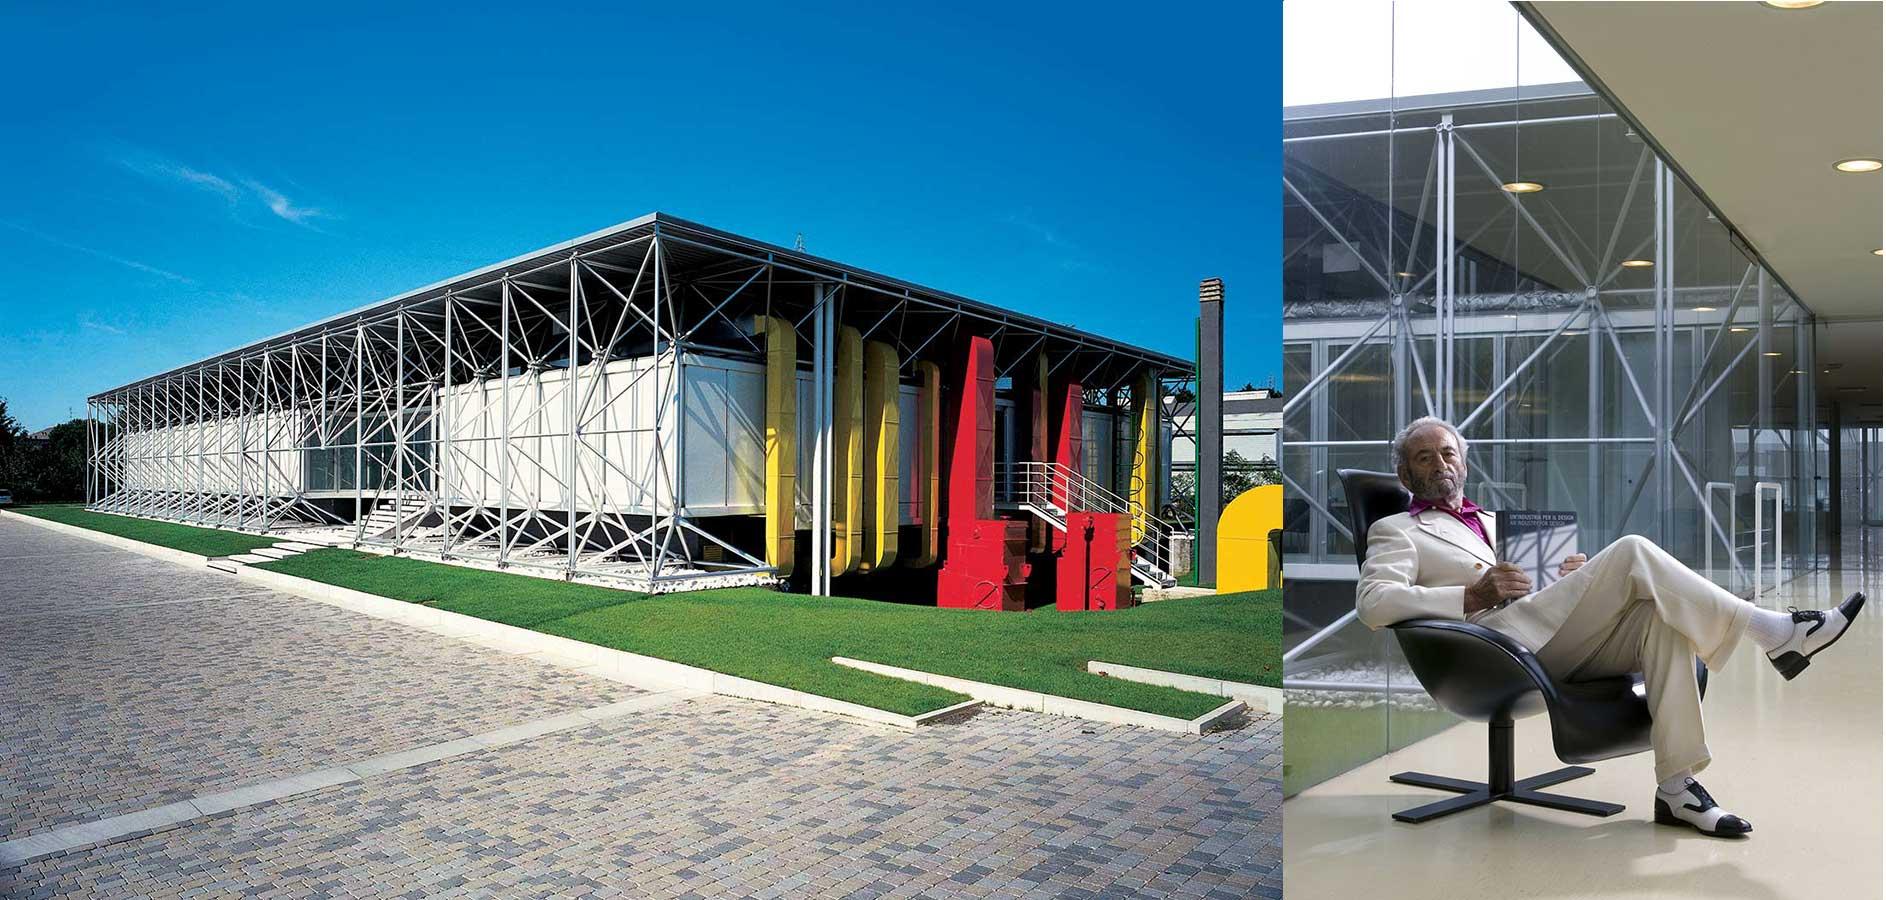 B&B Italia Headquarters in Novedrate, Italy, designed by Richard Rogers and Renzo Piano. Portrait of B&B Italia founder Piero Ambrogio Busnelli.